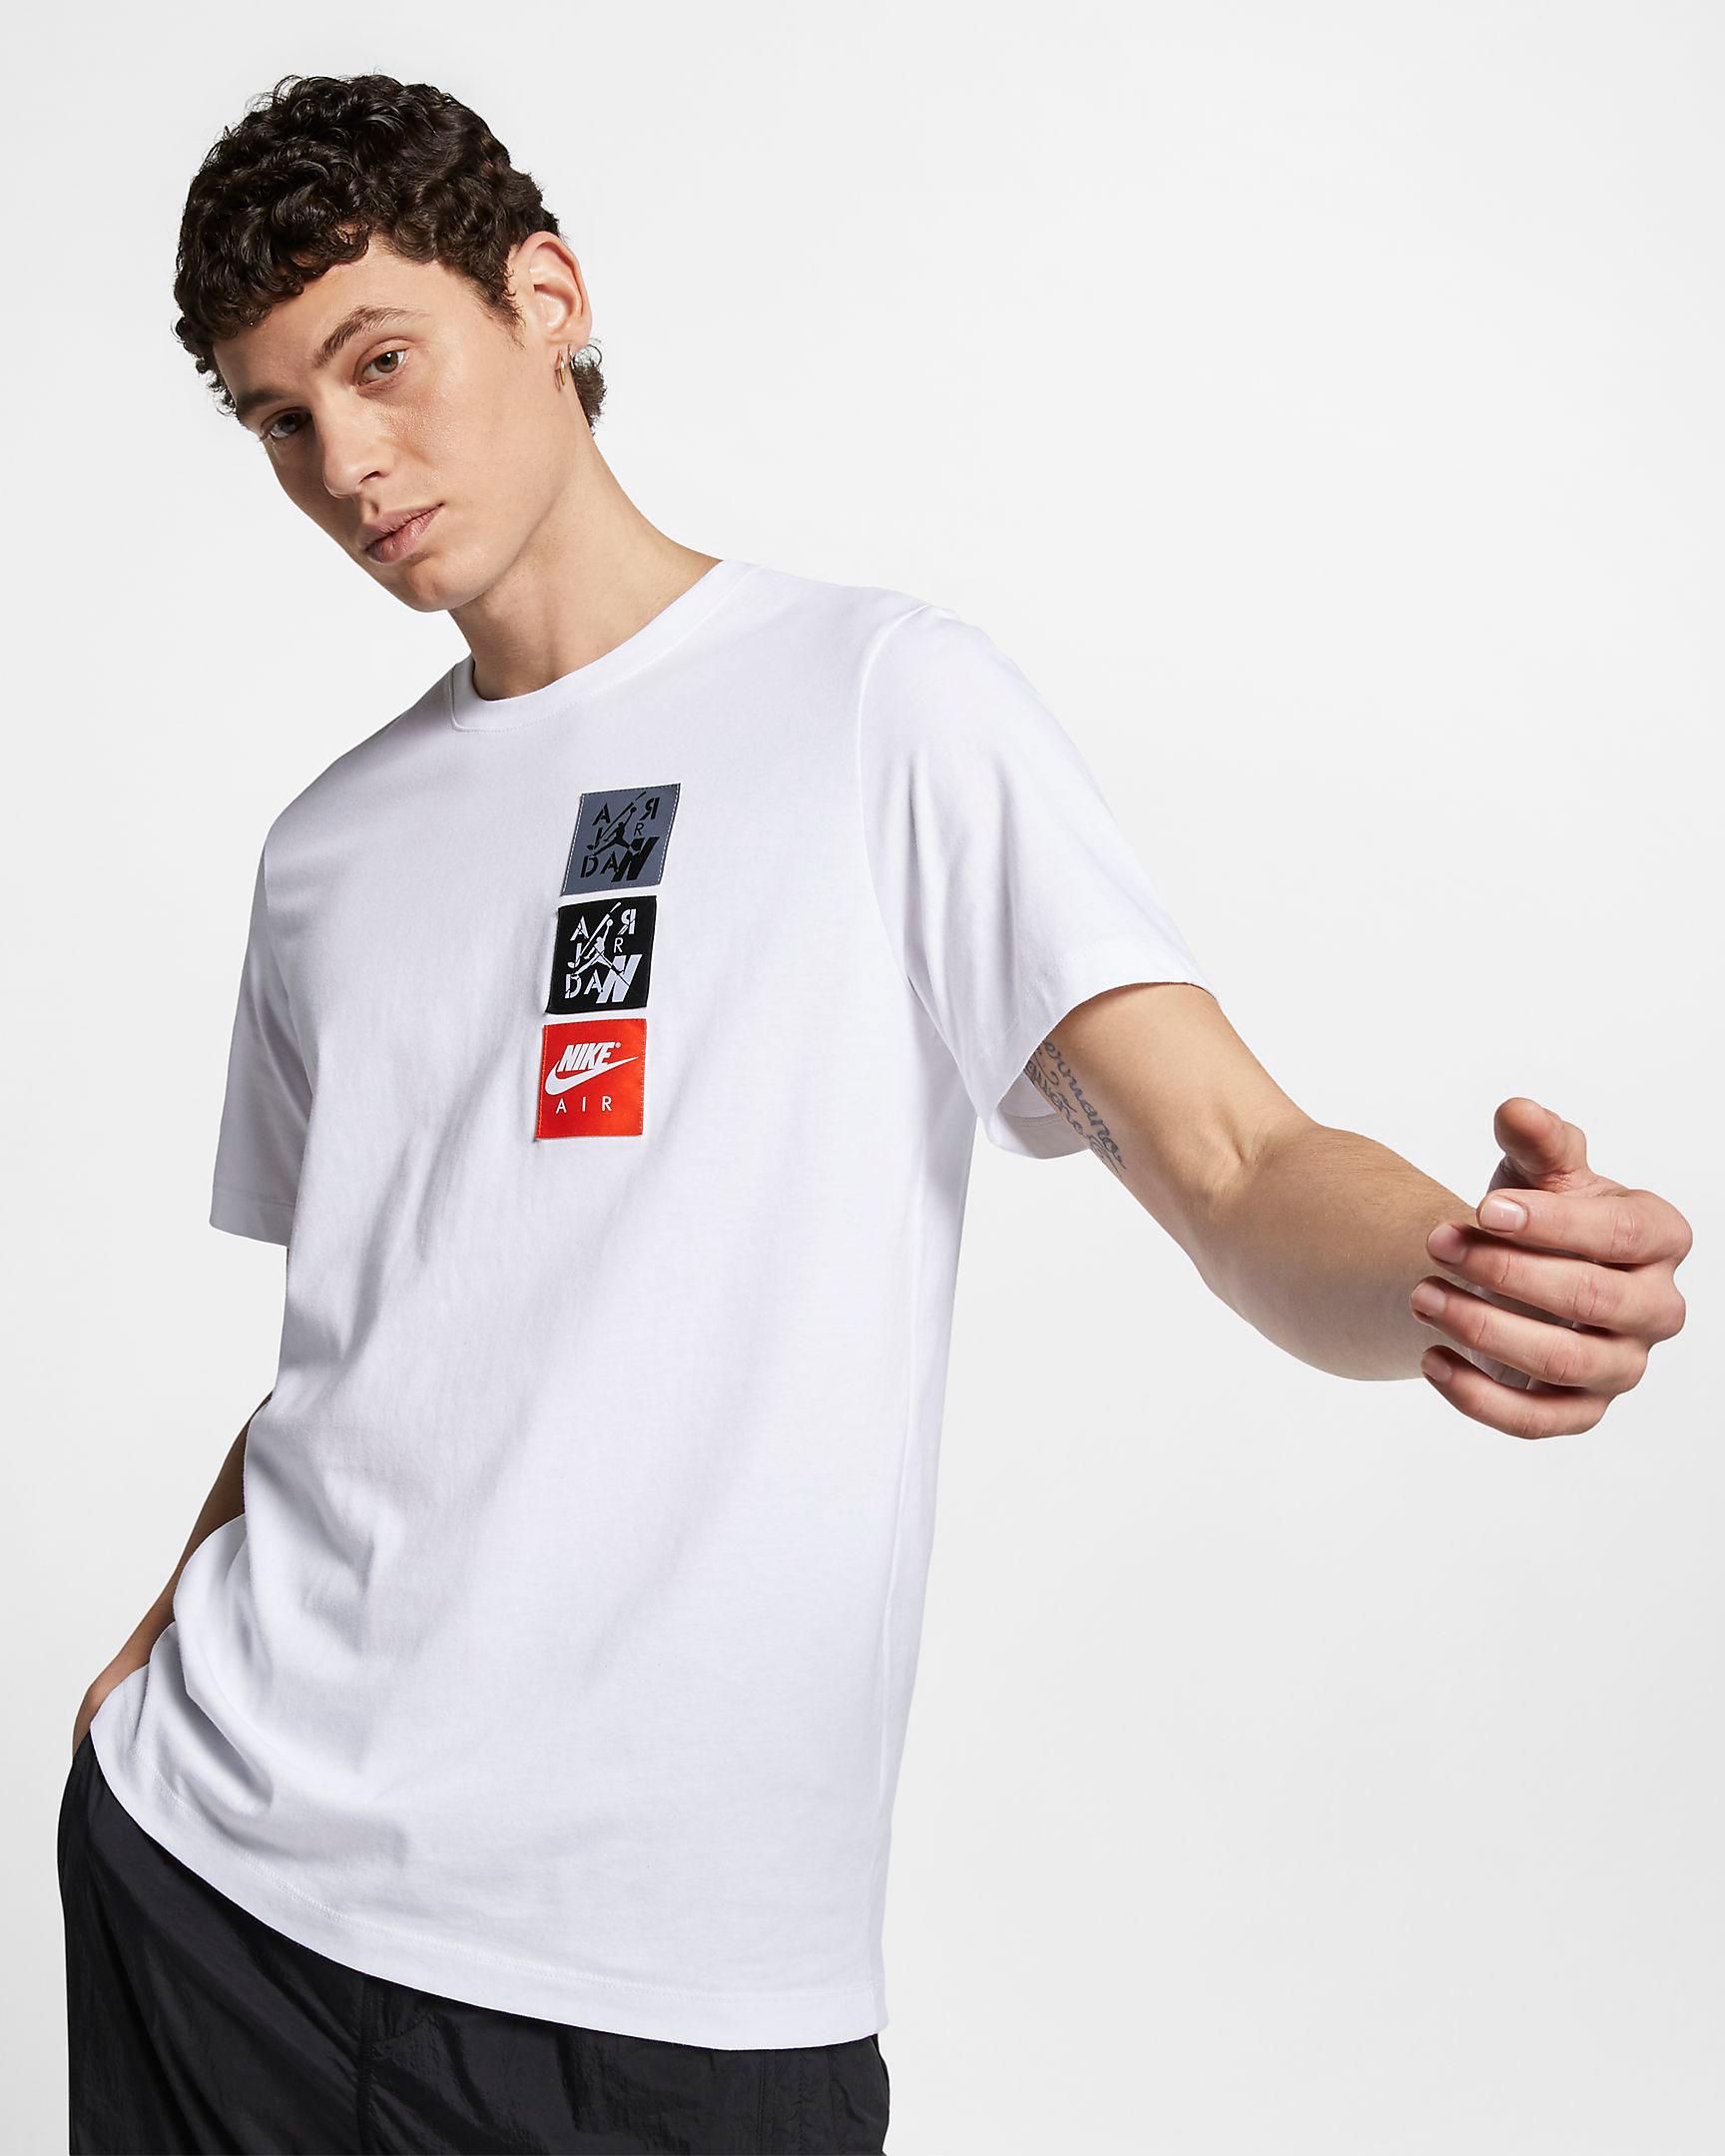 air-jordan-4-bred-2019-nike-air-shirt-4